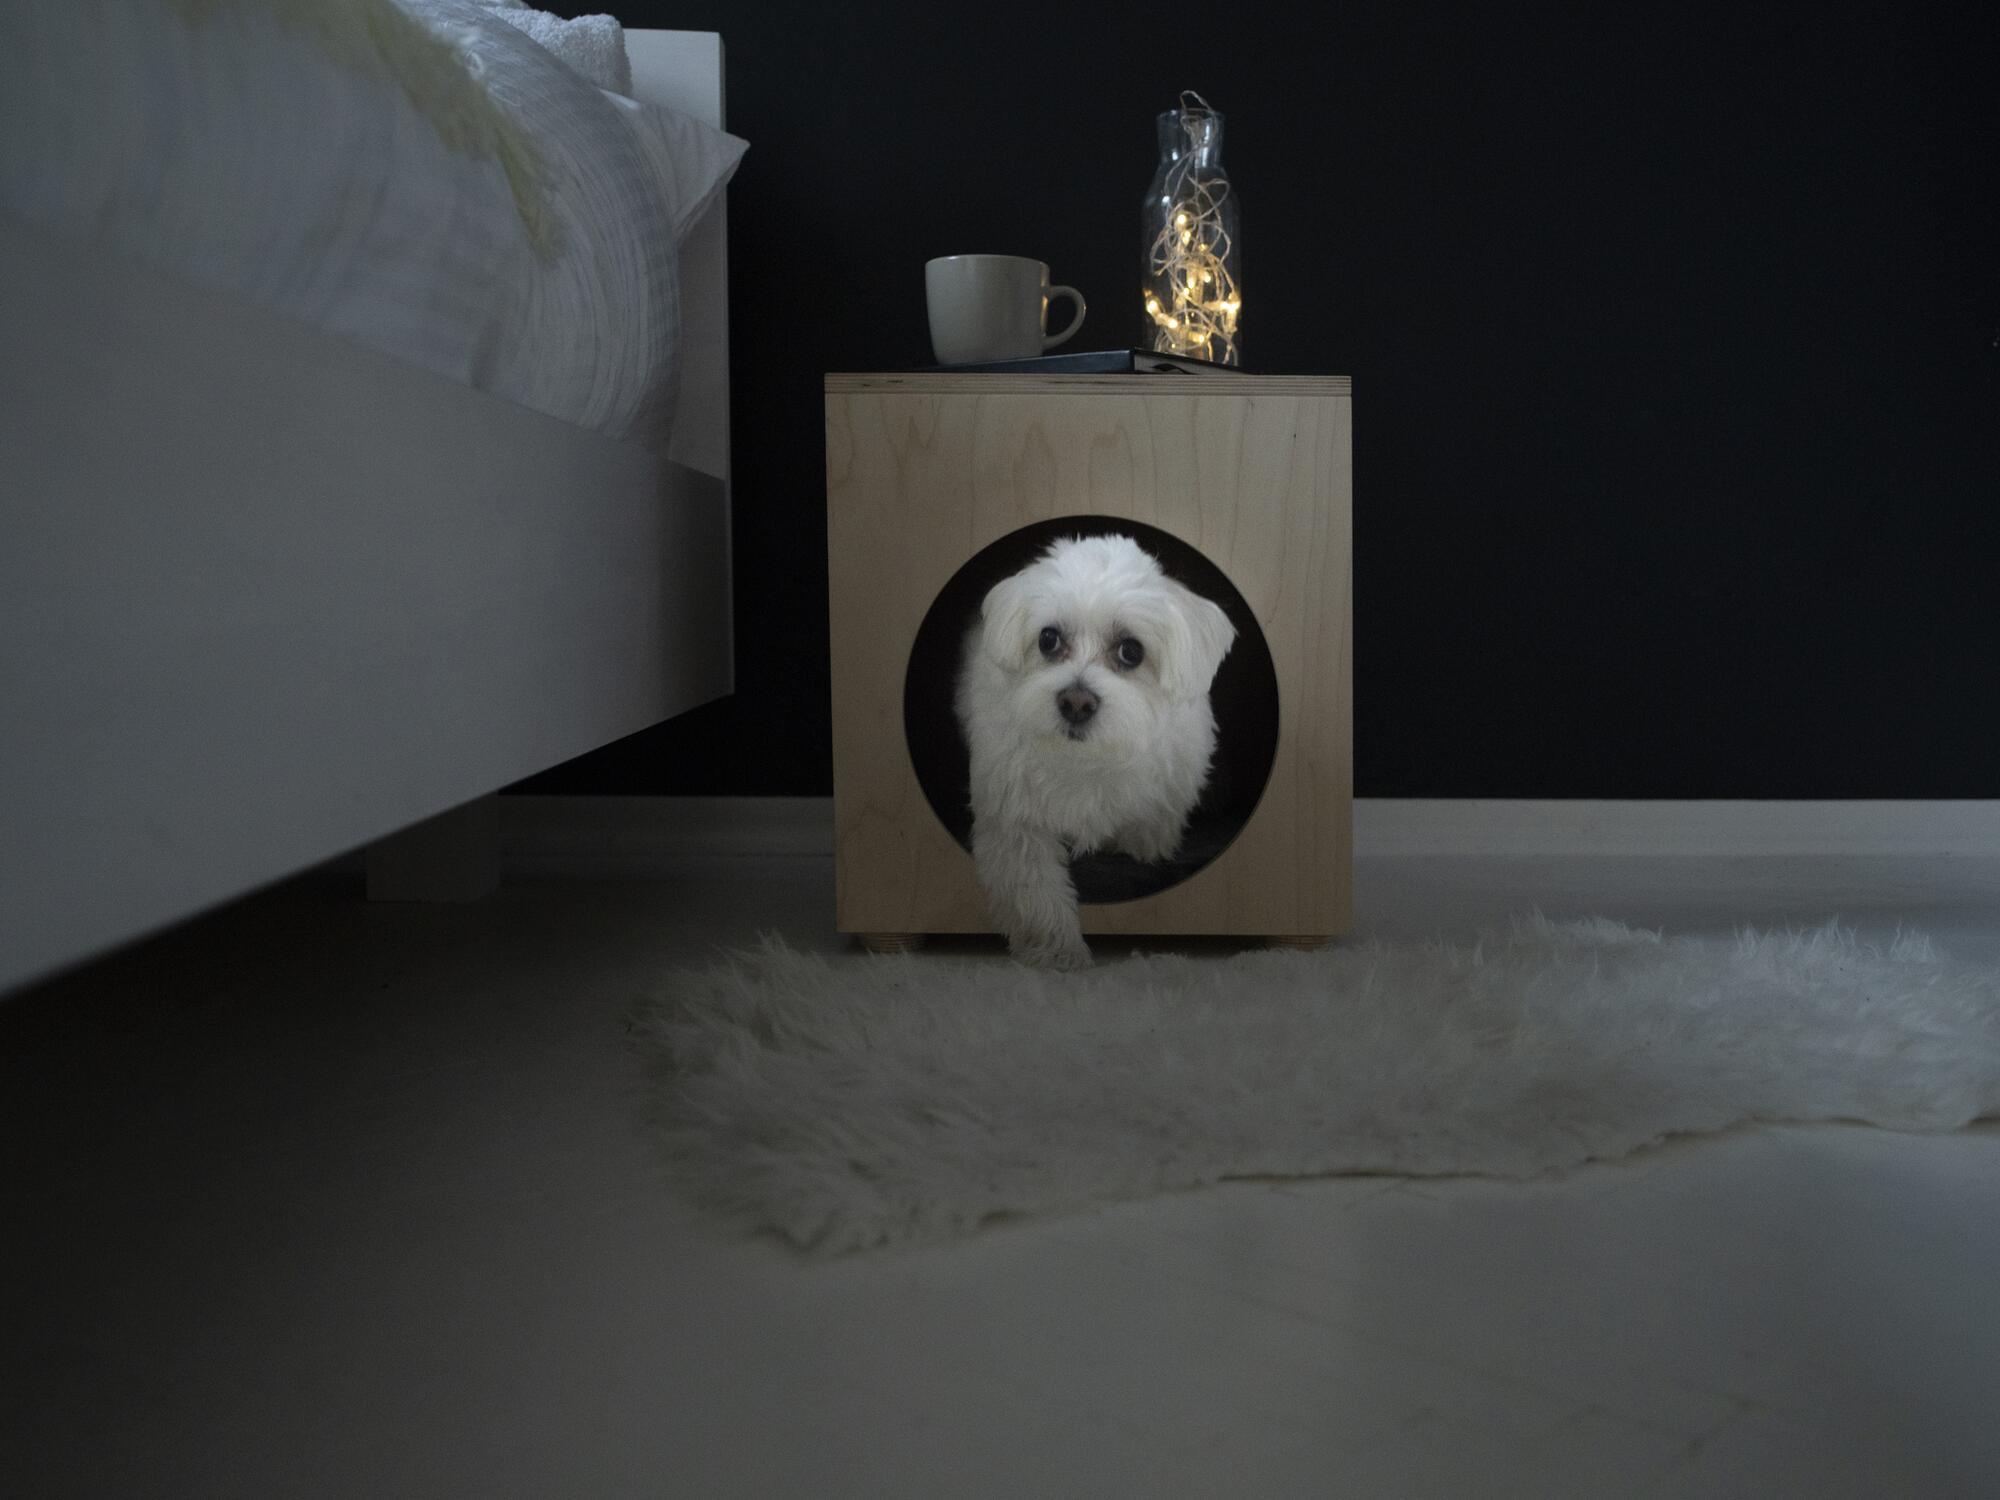 Domek dla kota/psa Dreamy Pet - Dreamy Noses Pamela Adamik   JestemSlow.pl